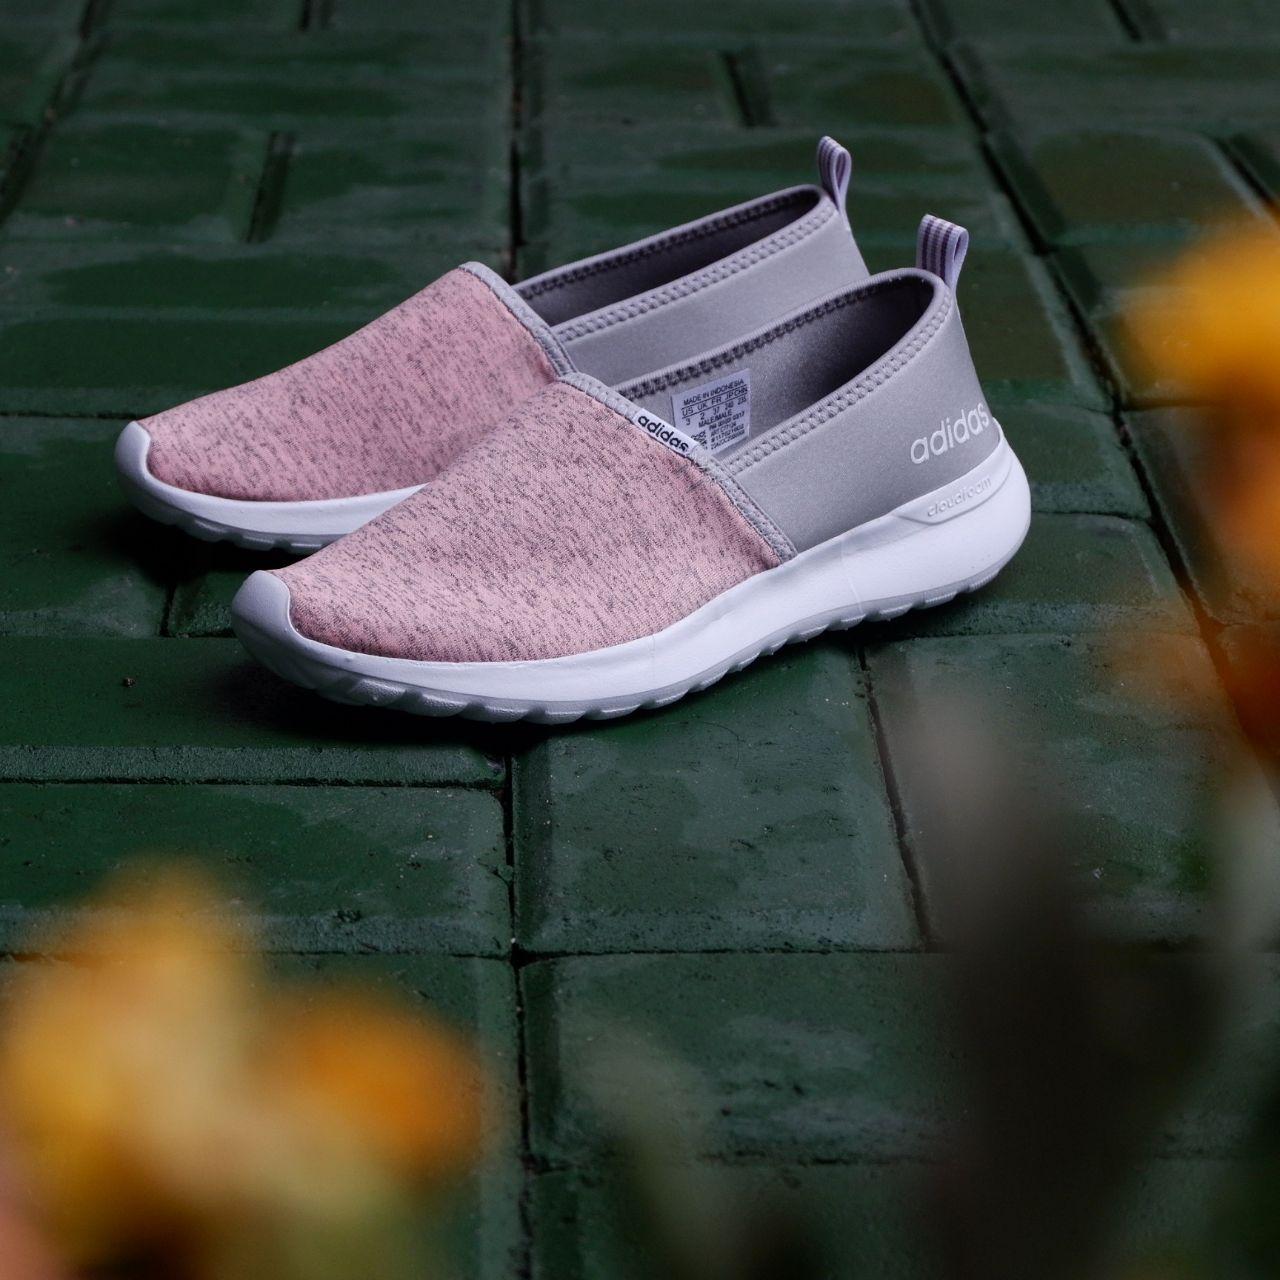 Sepatu Adidas ORIGINAL Cloudfoam Neo Lite Racer Slip-On Peach Grey  Peach  Pink 60050847b7